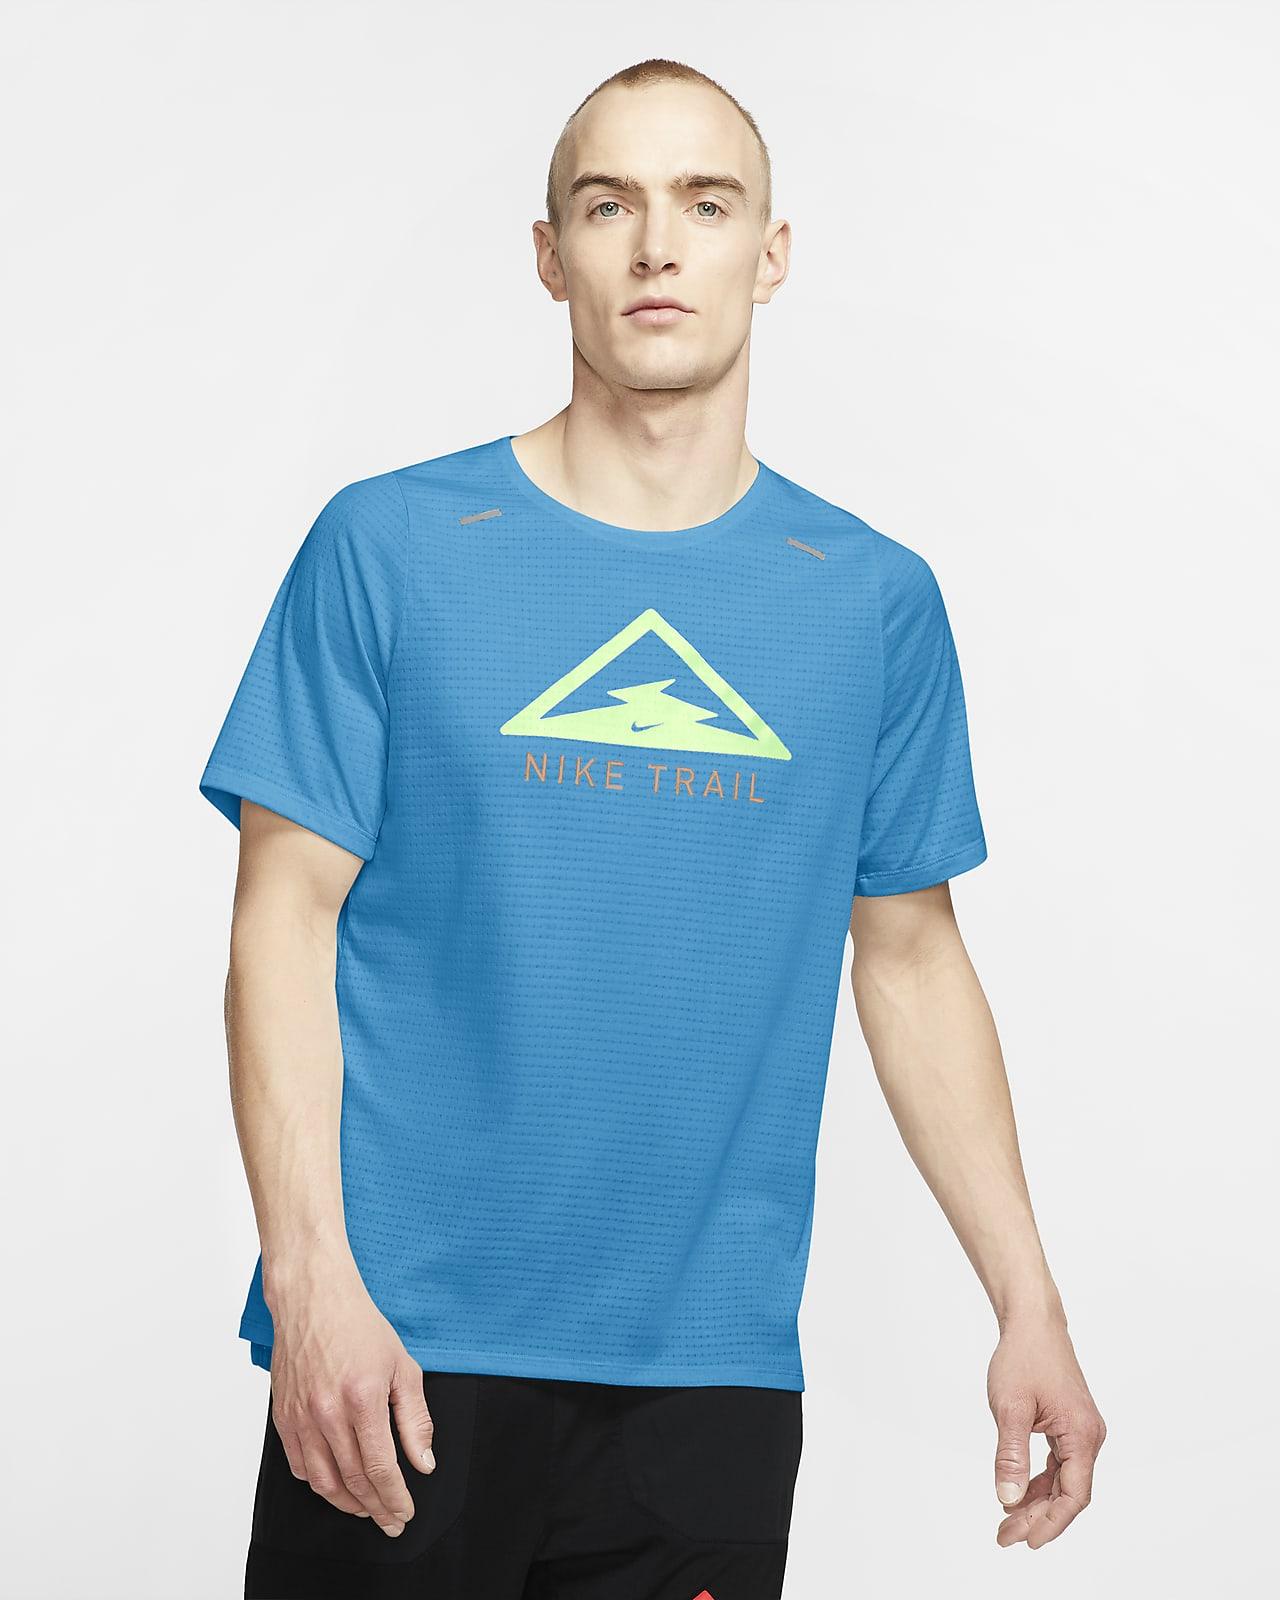 Nike Rise 365 Trail Men's Trail Running Top